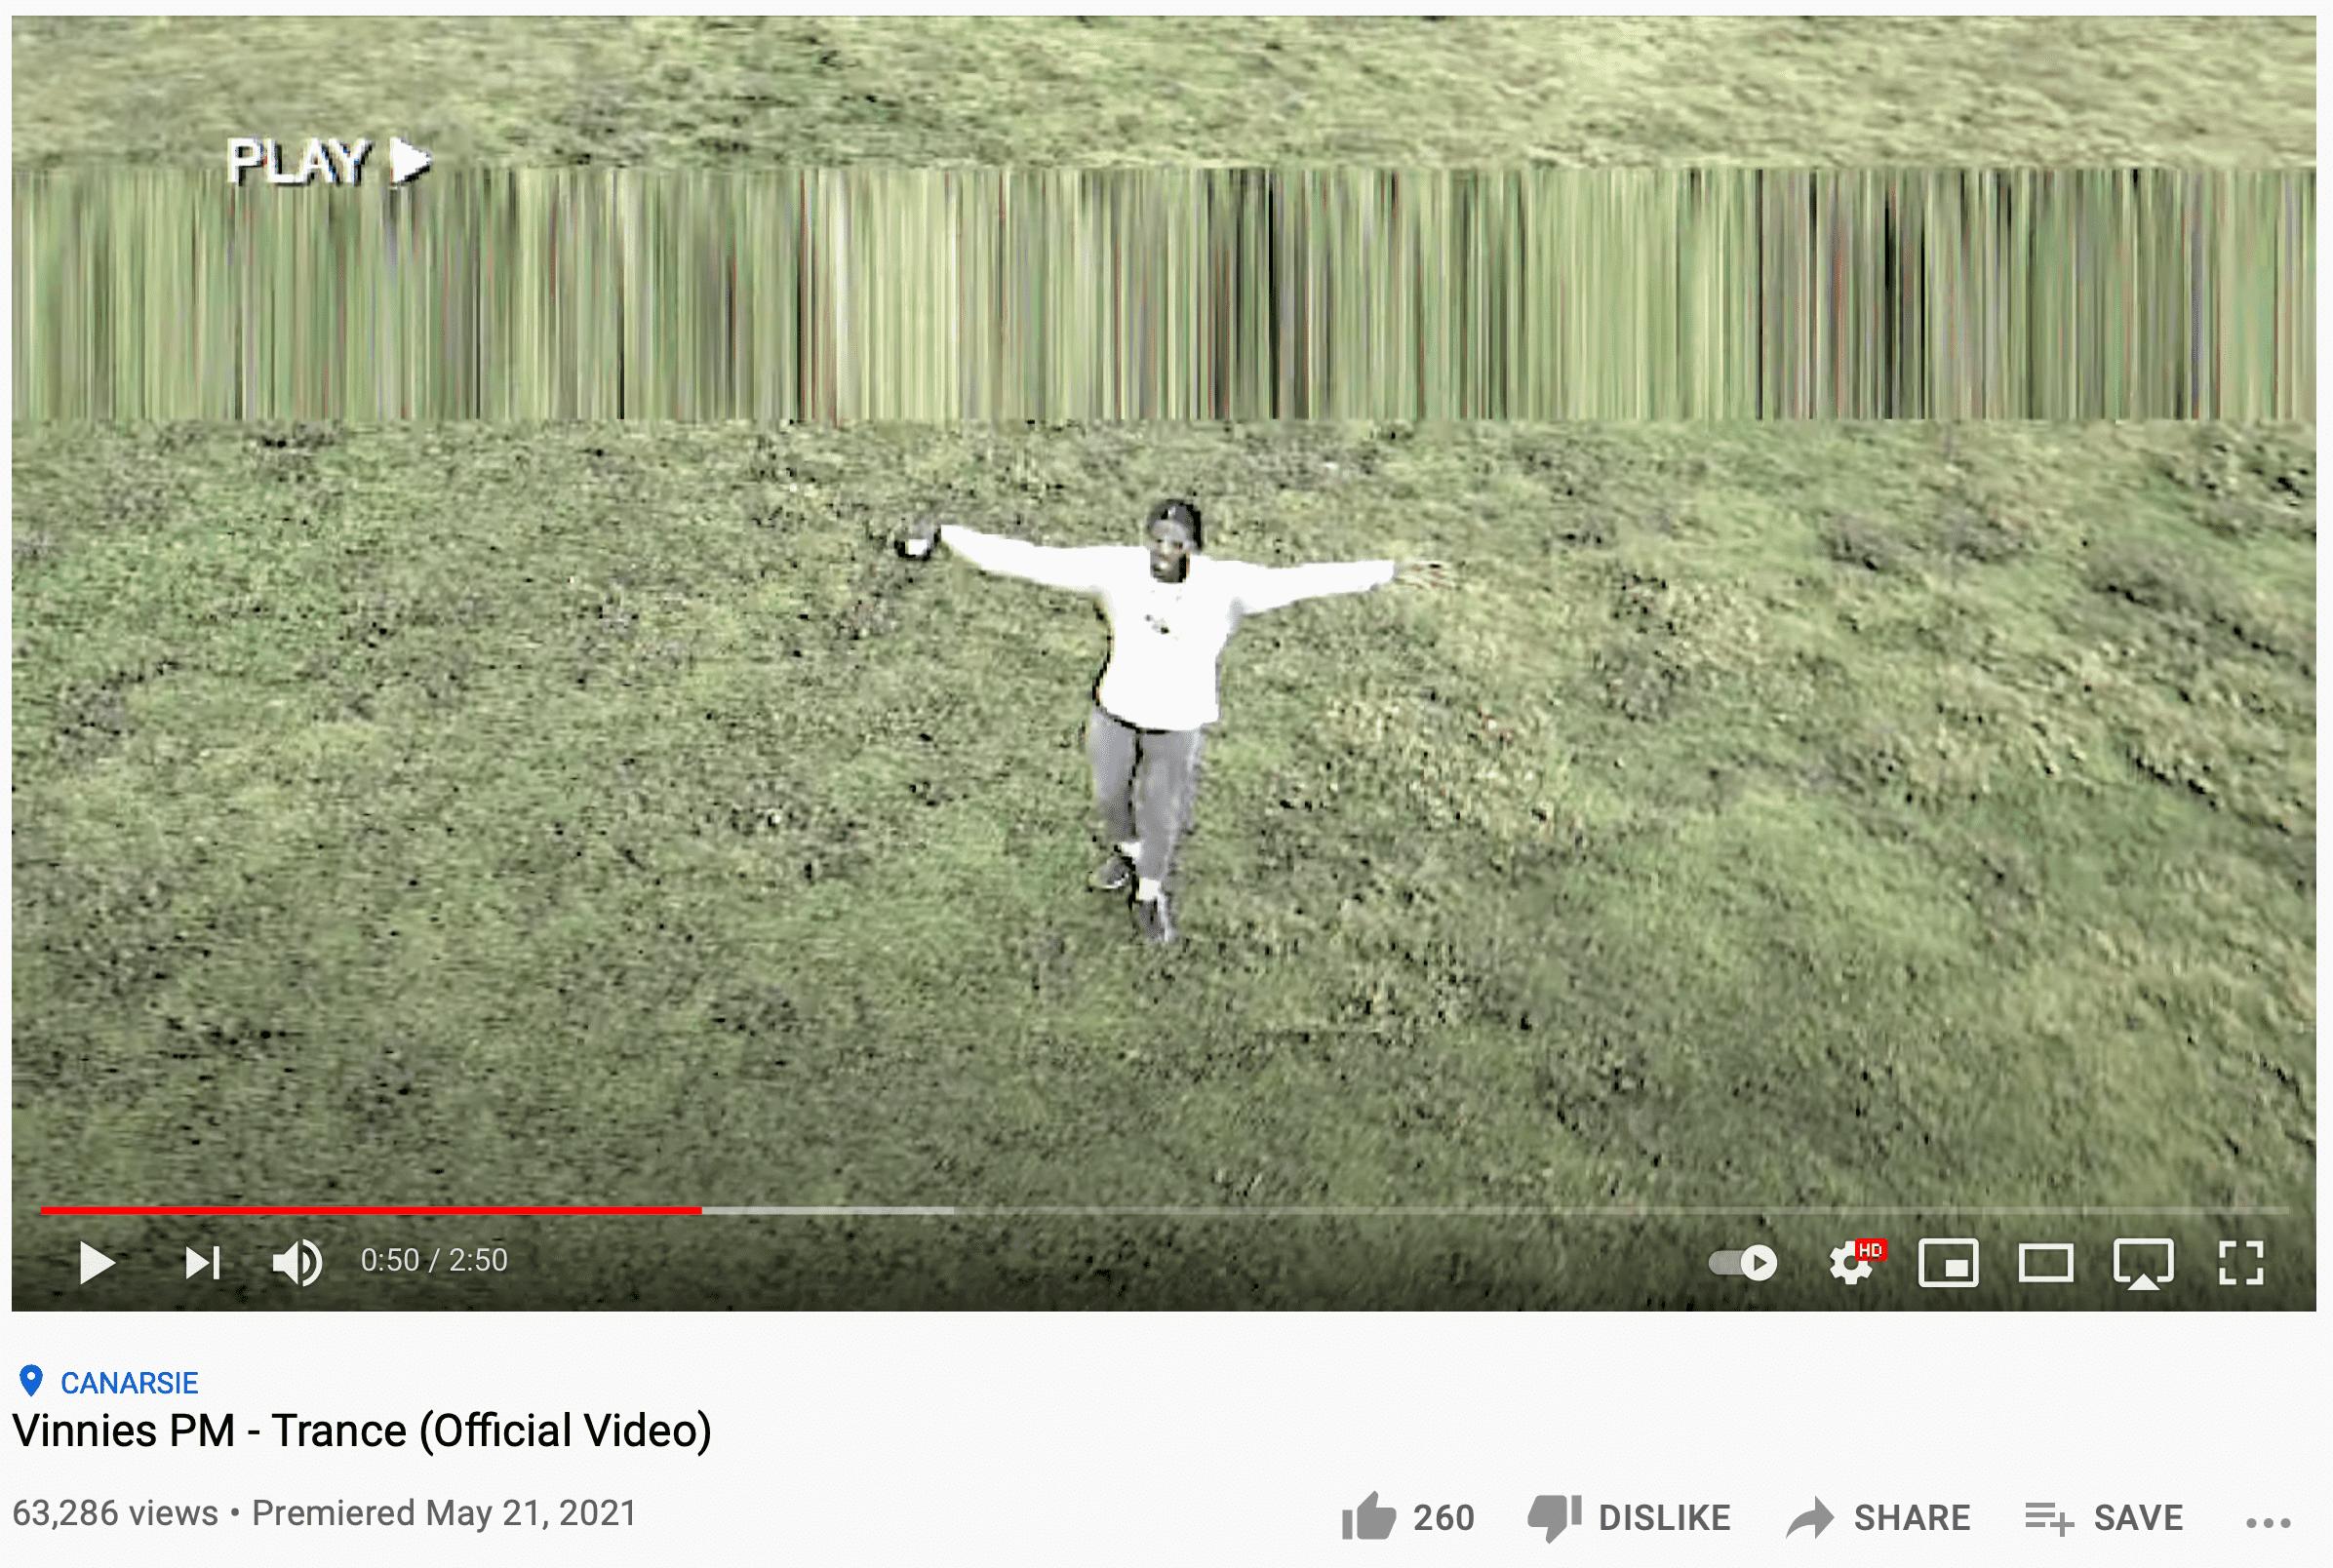 Vinnies PM - Trance